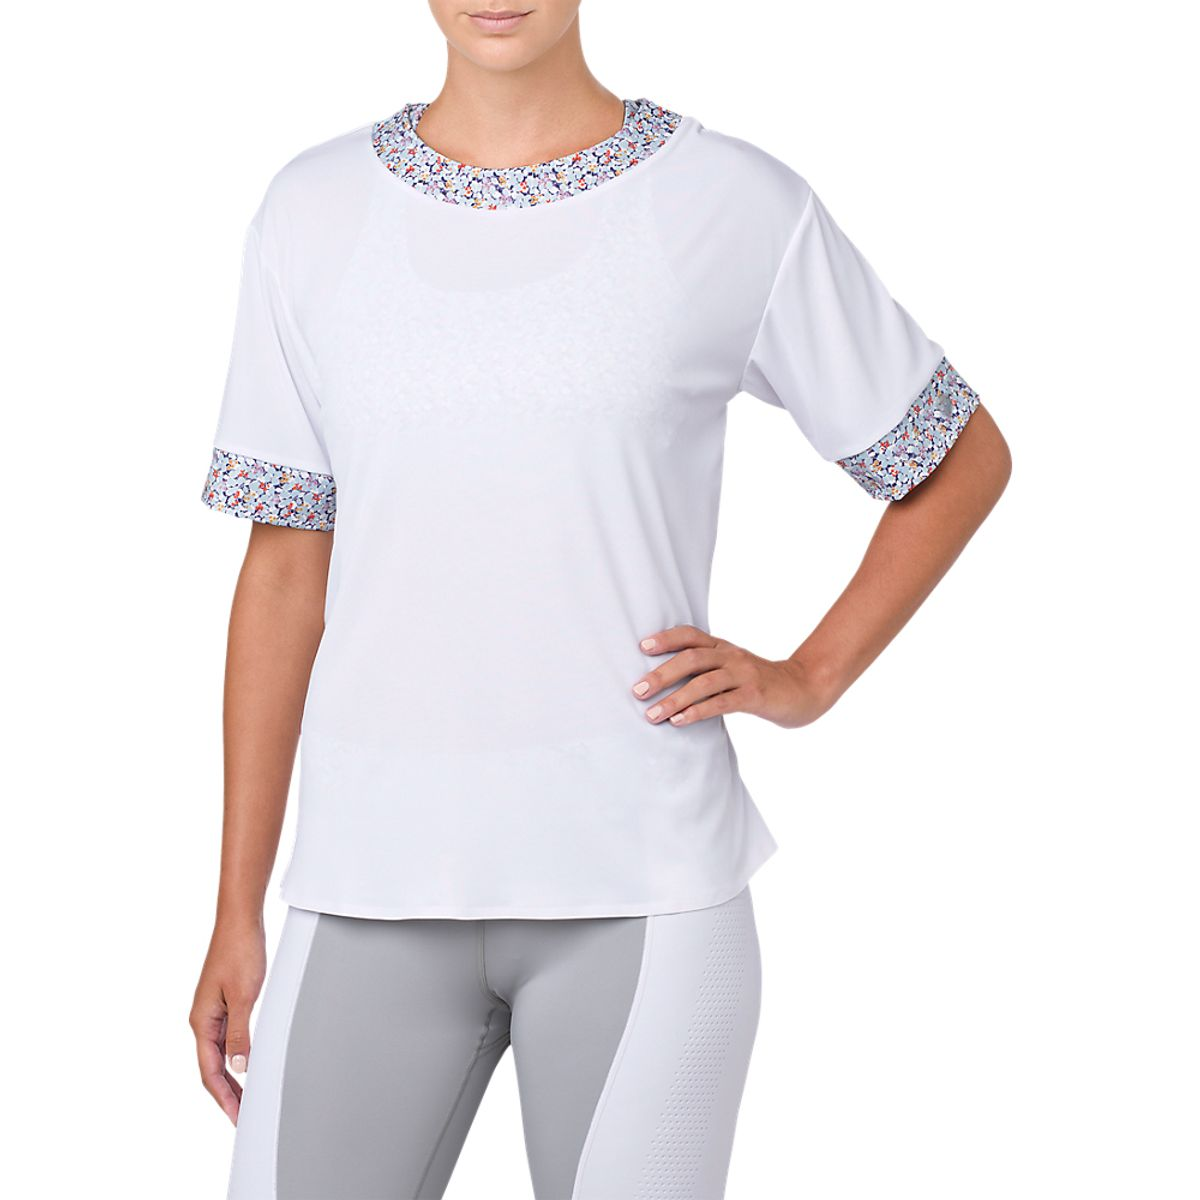 Camiseta-Asics-Liberty-Fabrics---Feminino---Branco